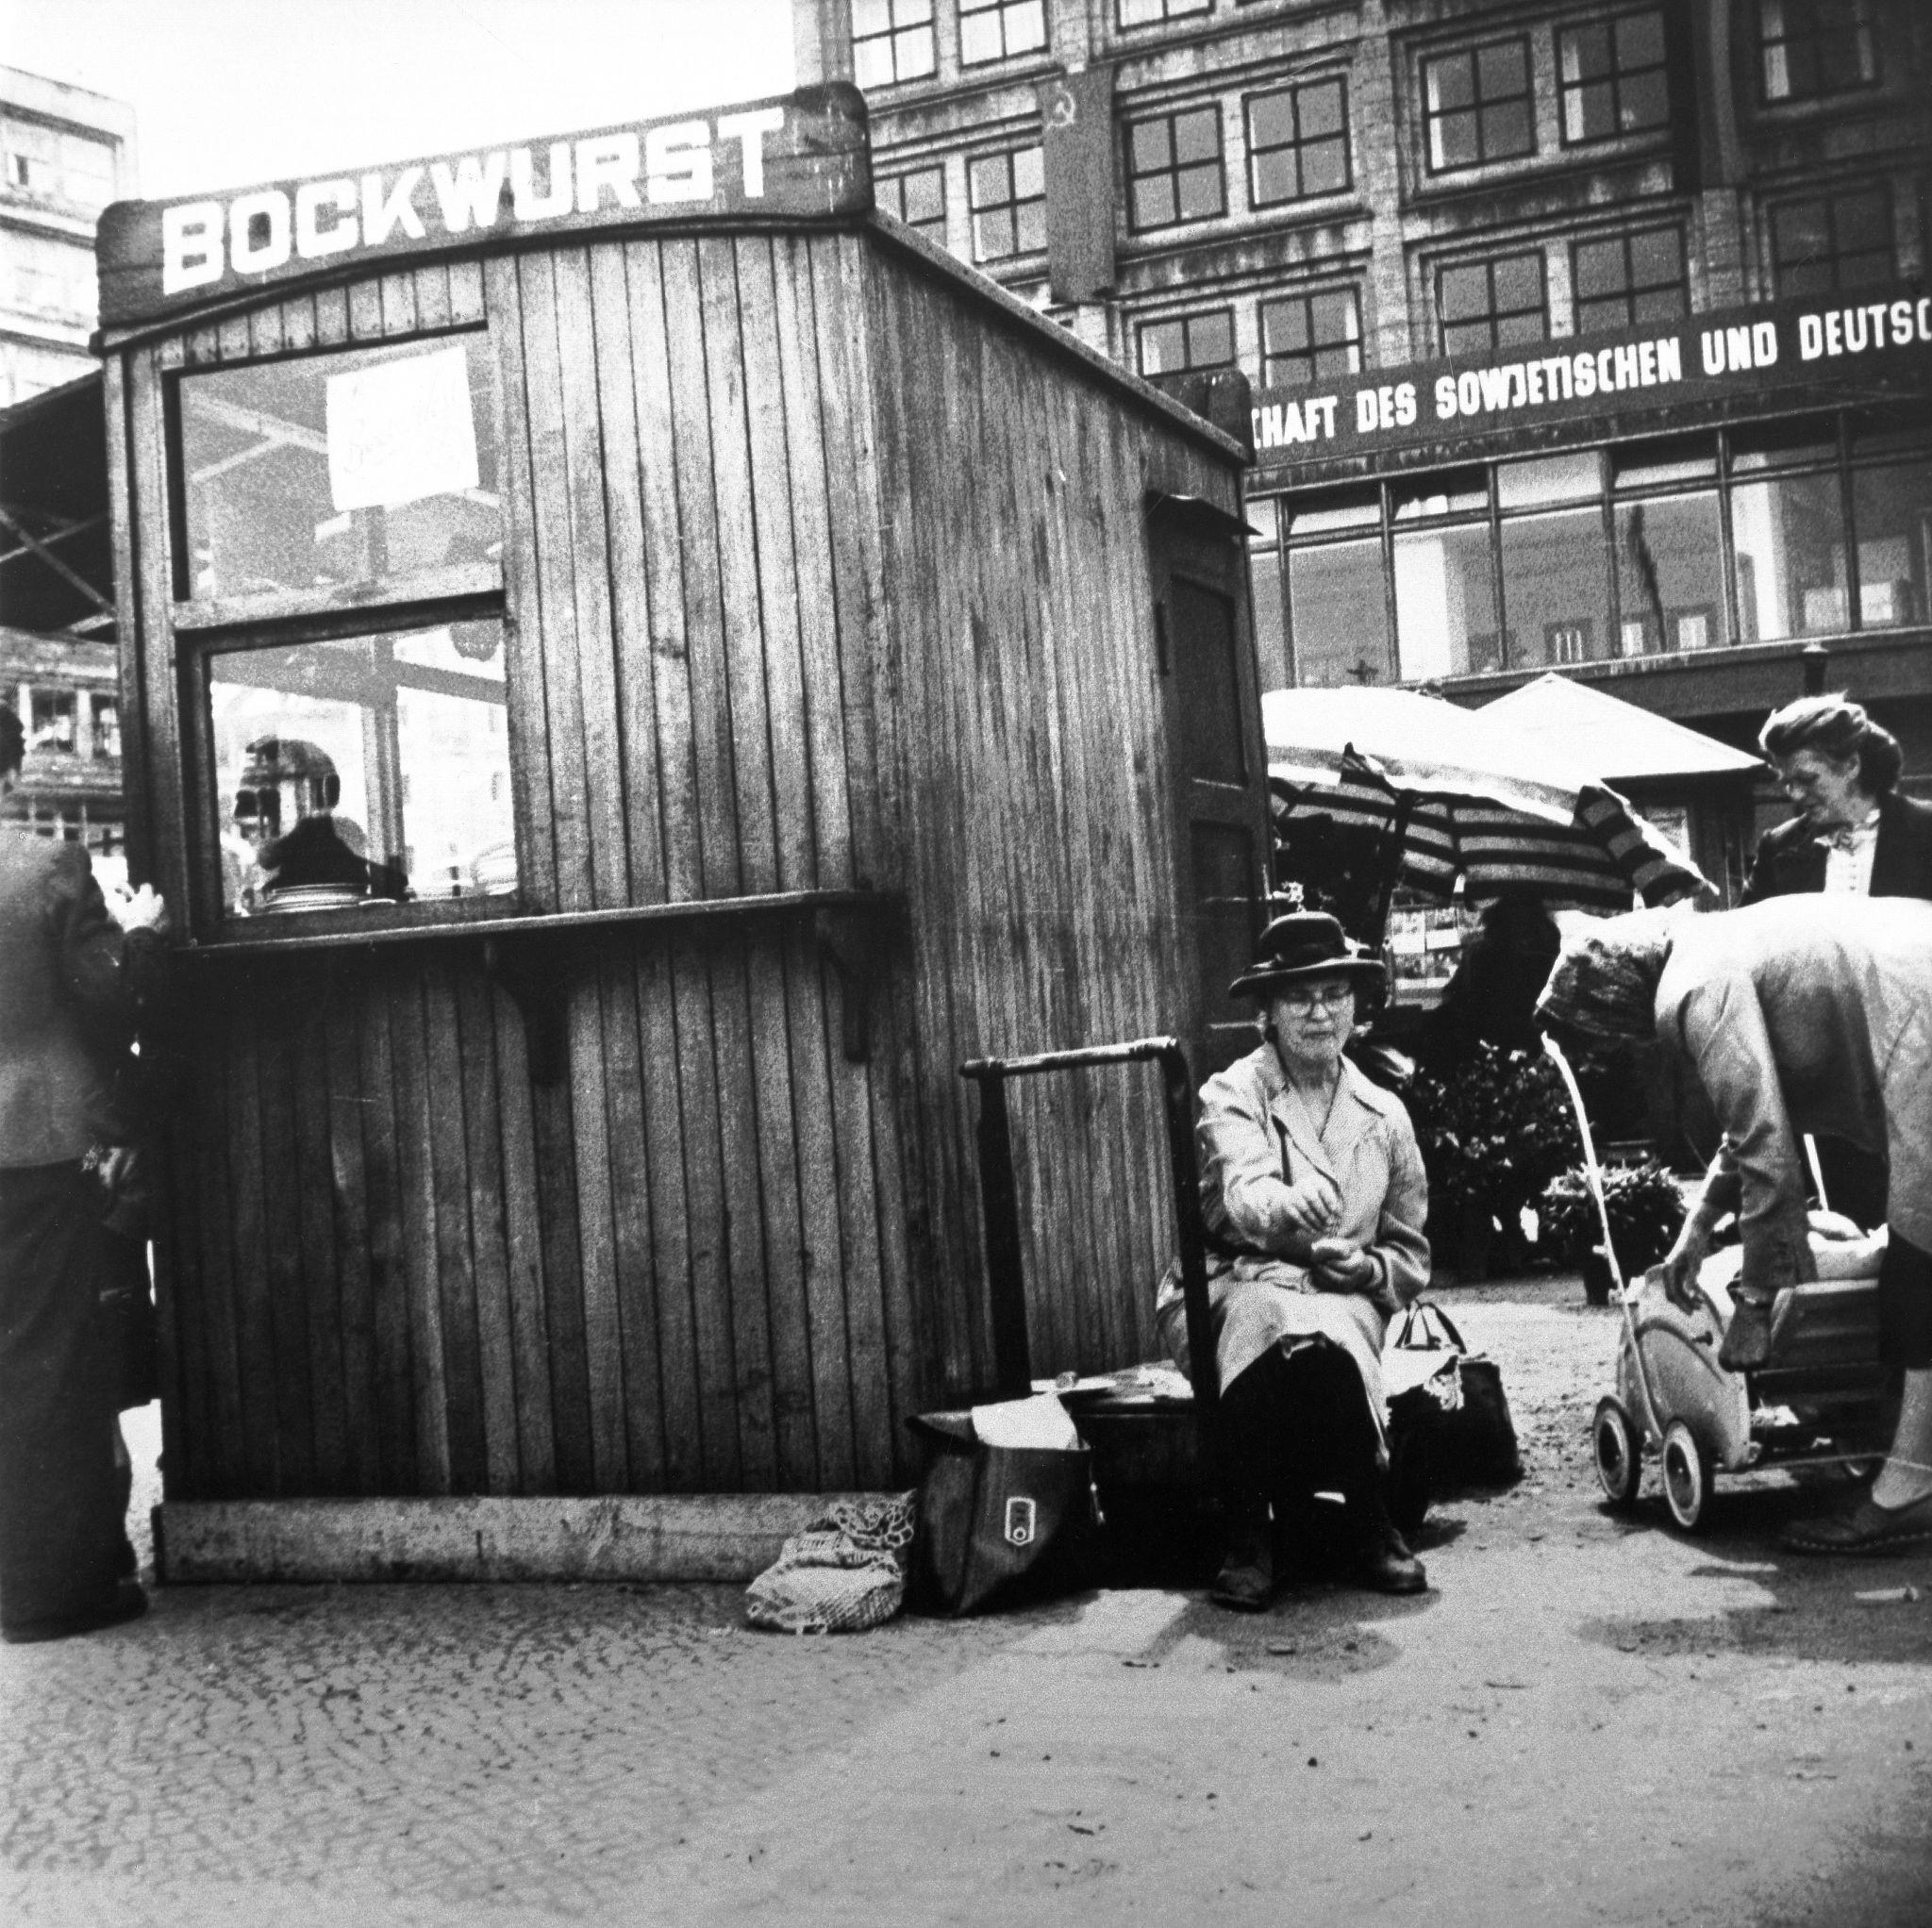 1953. Ларек, торгующий горячими сардельками на Александрплац